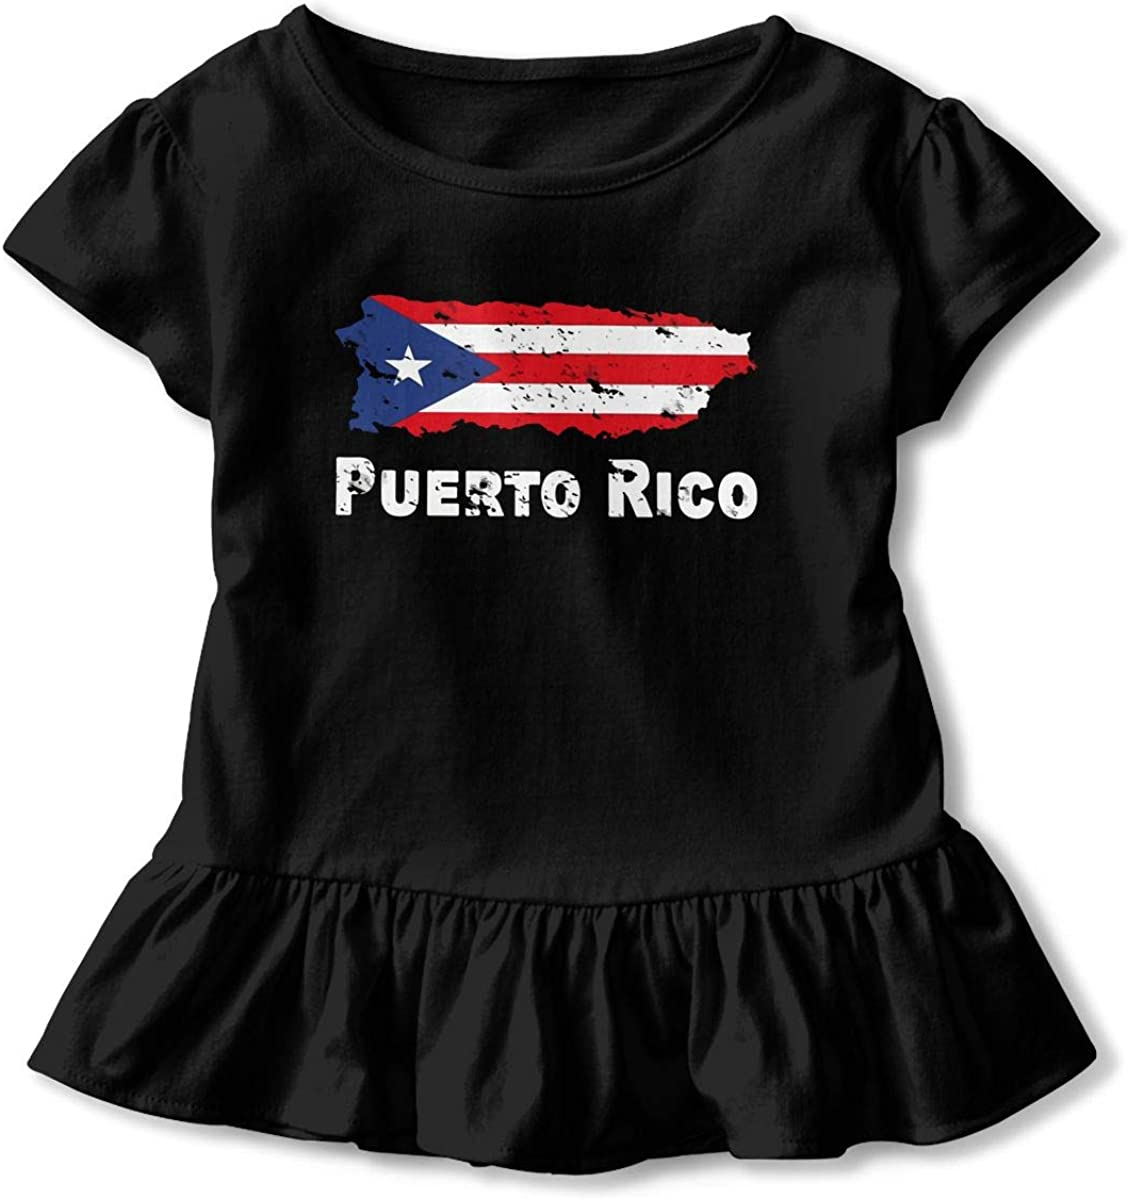 Puerto Rico Flag Support Puerto Rico Toddler Girls T Shirt Kids Cotton Short Sleeve Ruffle Tee